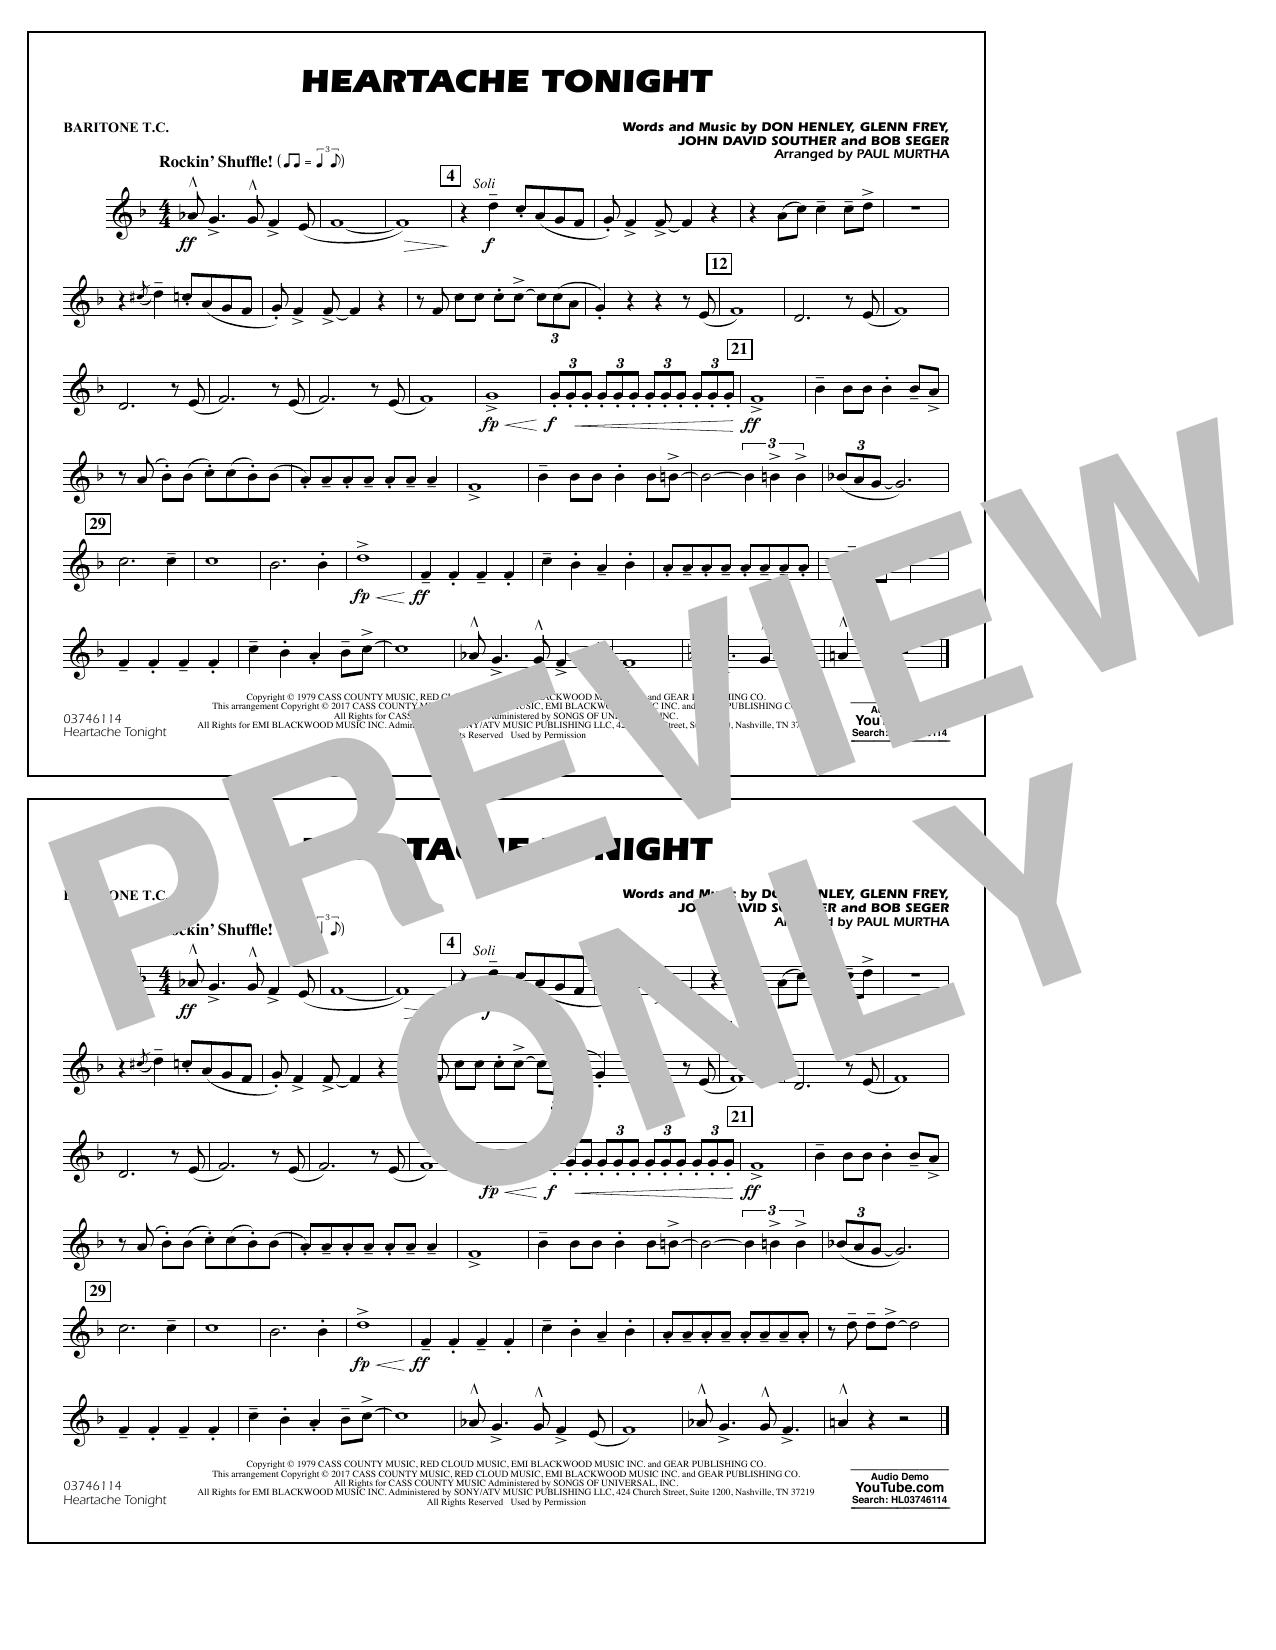 Heartache Tonight - Baritone T.C. Sheet Music